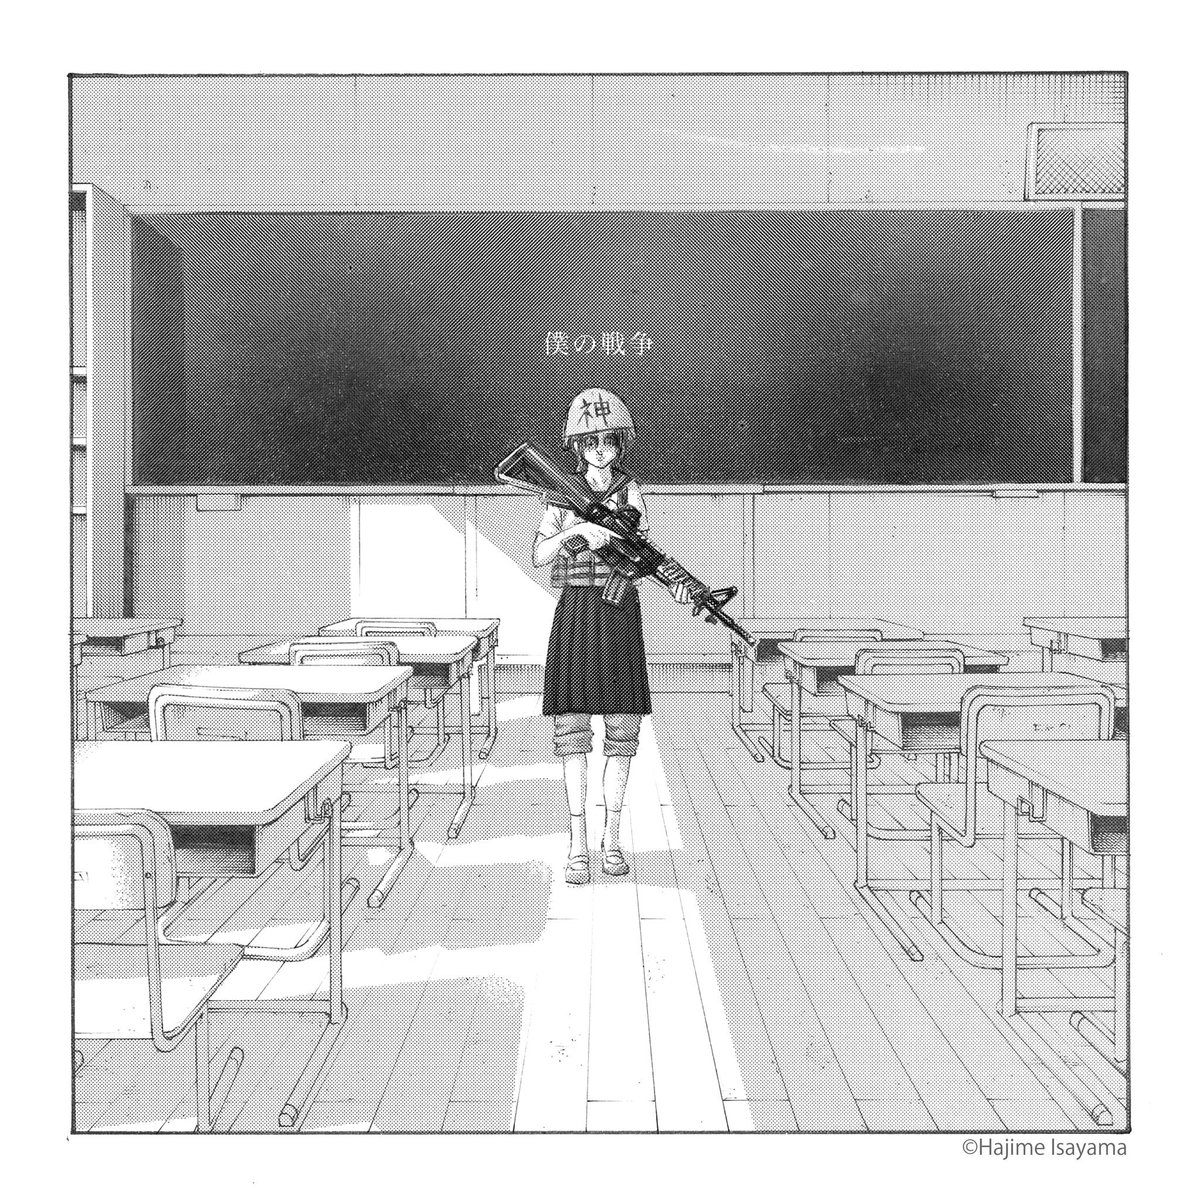 Replying to @AoTWiki: My War - CD Jacket illustration drawn by Hajime Isayama